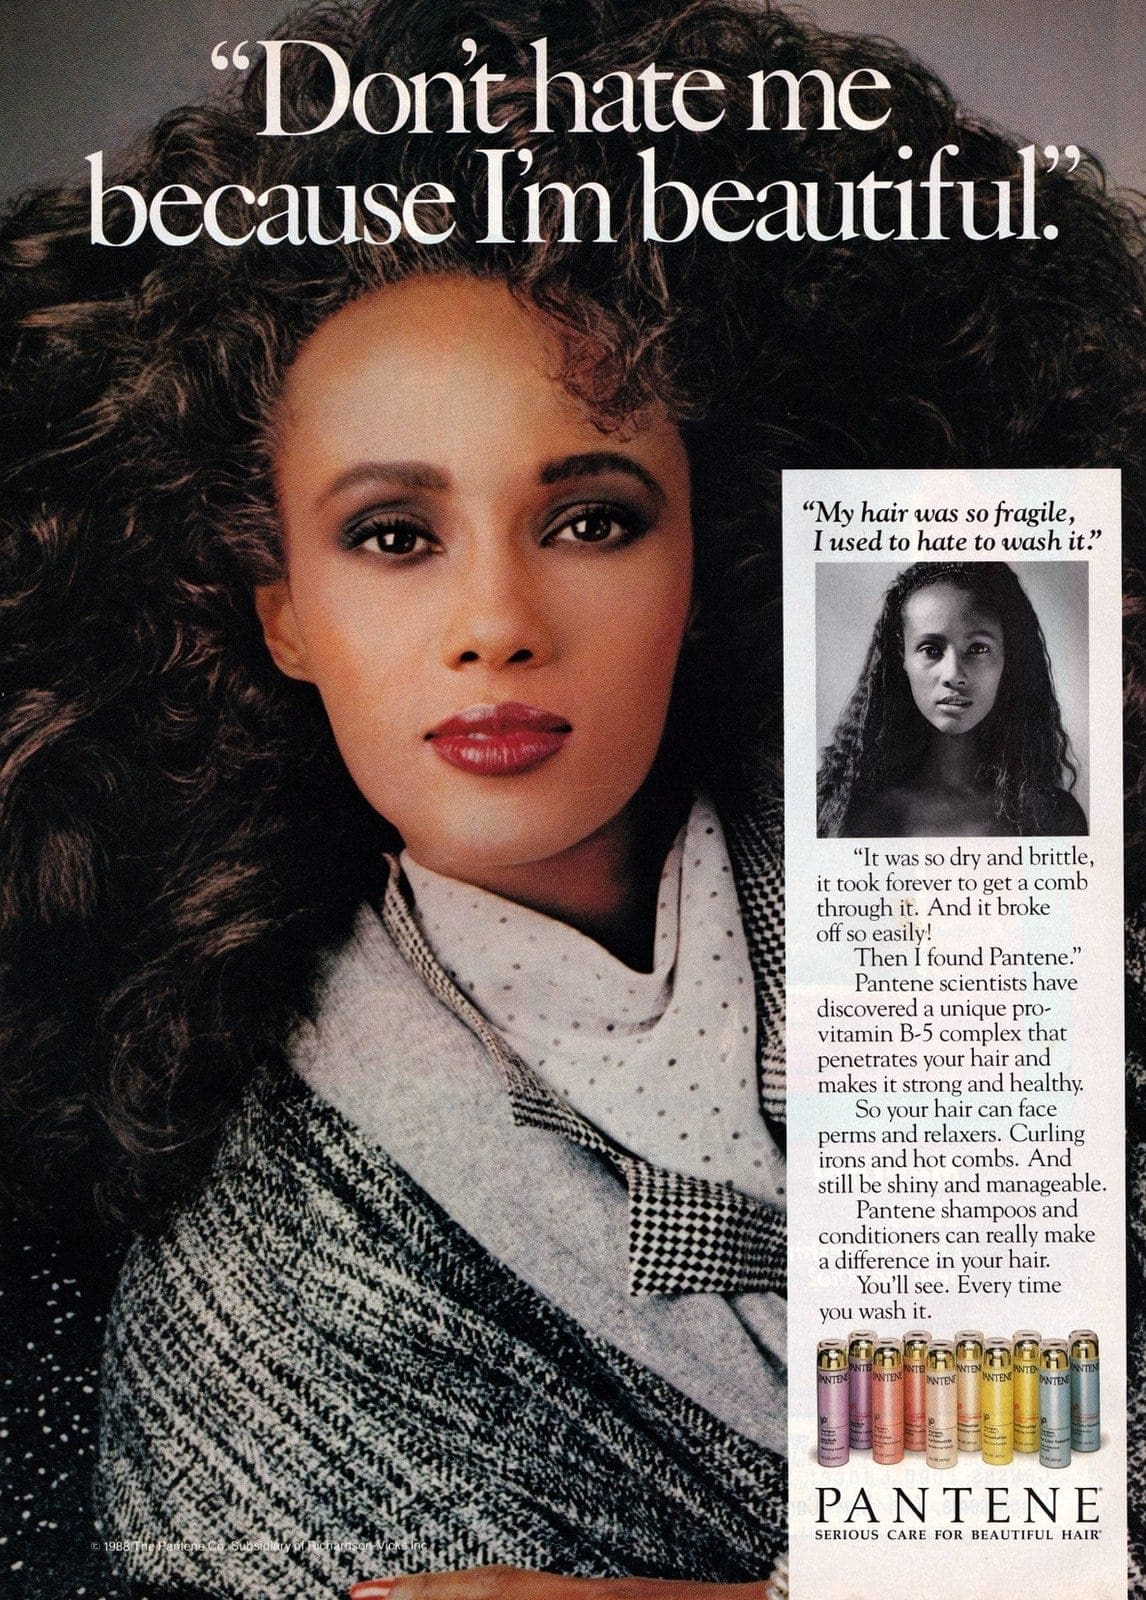 Iman Pantene ad 1987